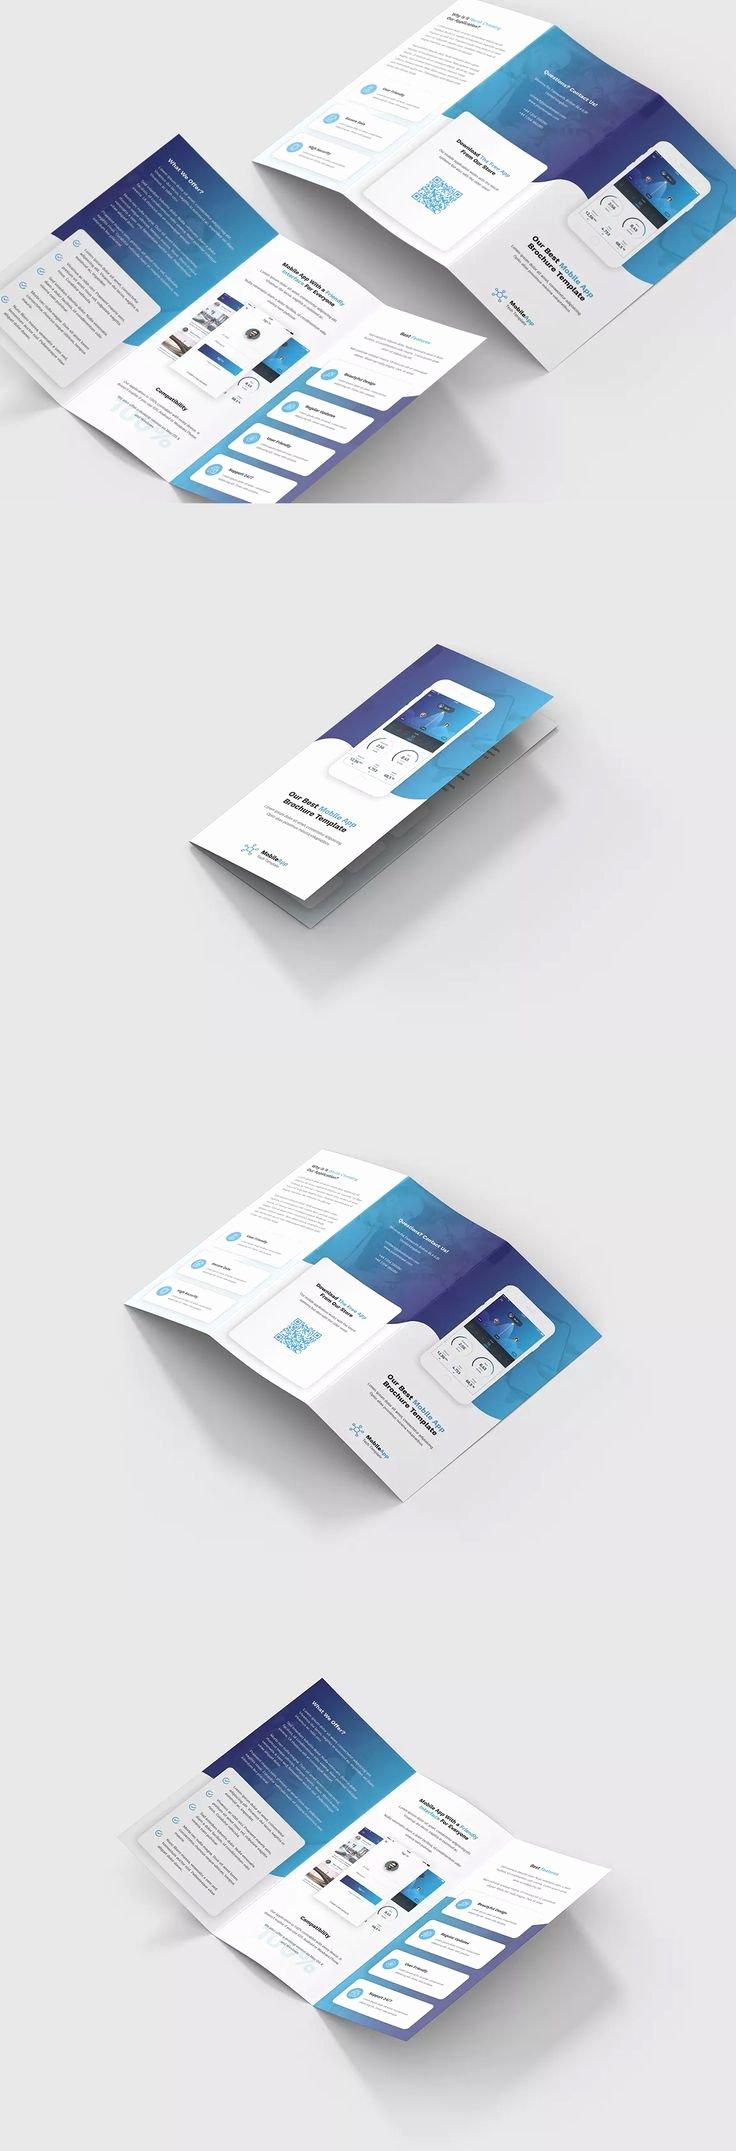 Tri Fold Brochure Size Elegant Mobile App Tri Fold Brochure Template Psd A4 Size – 29